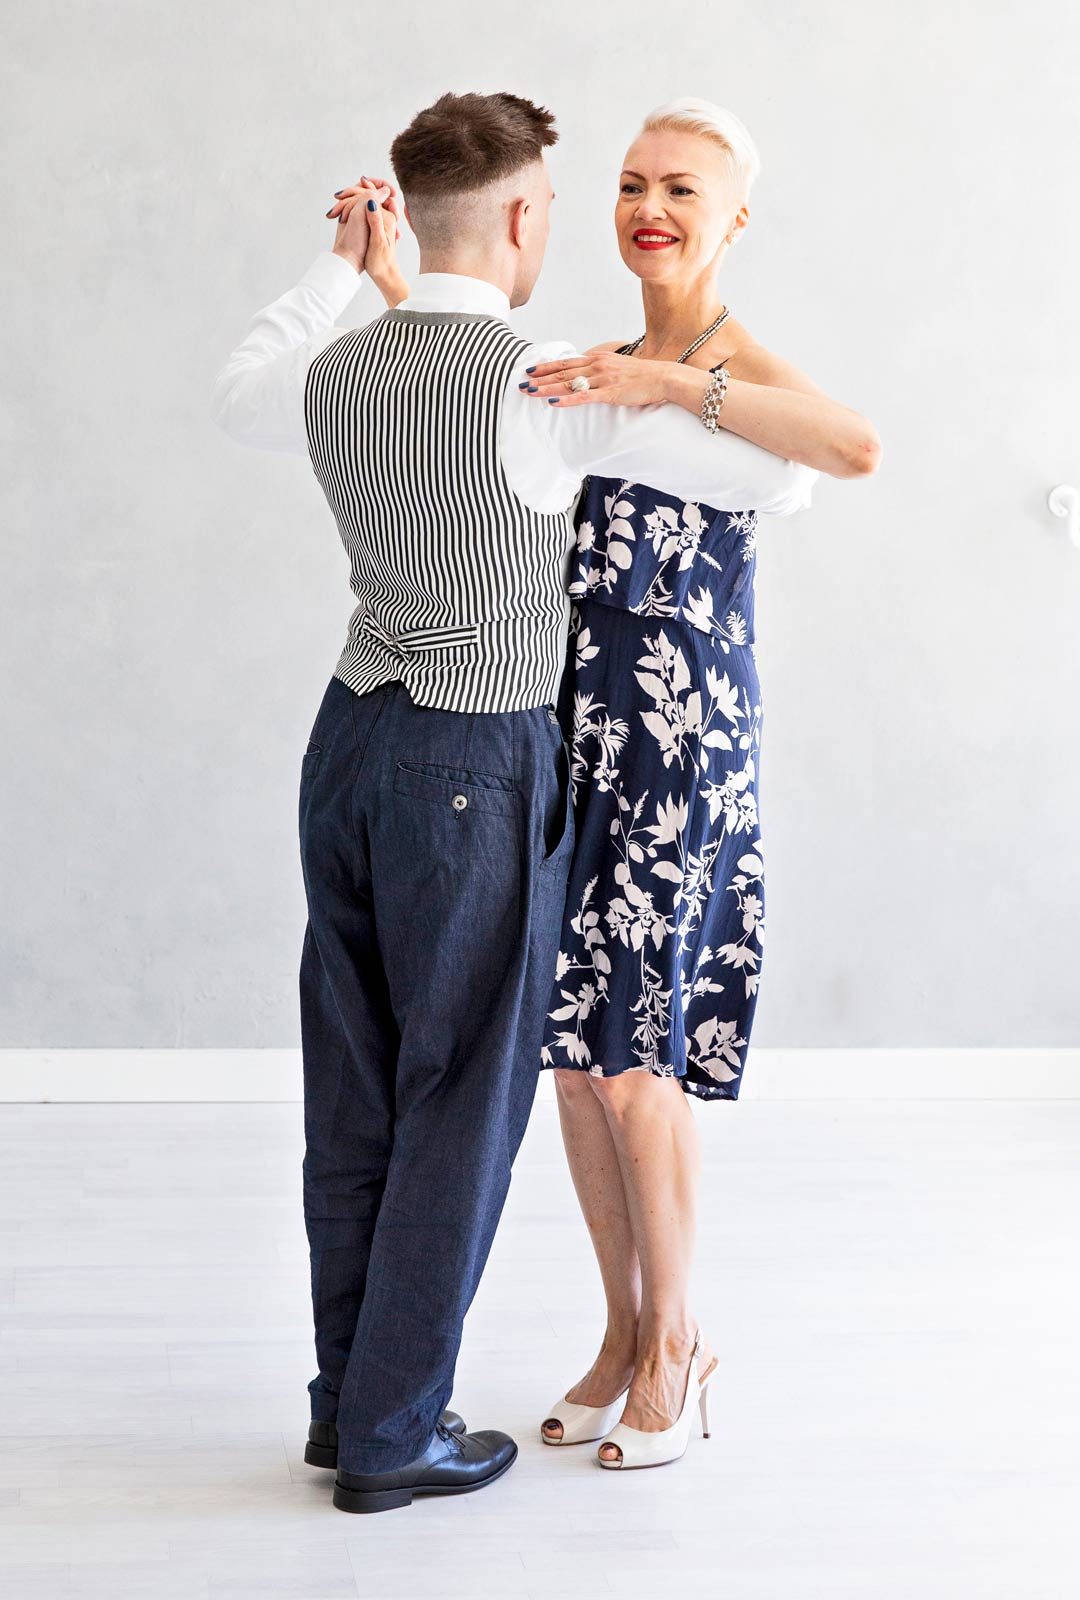 Neljäs tanssiaskel, tango